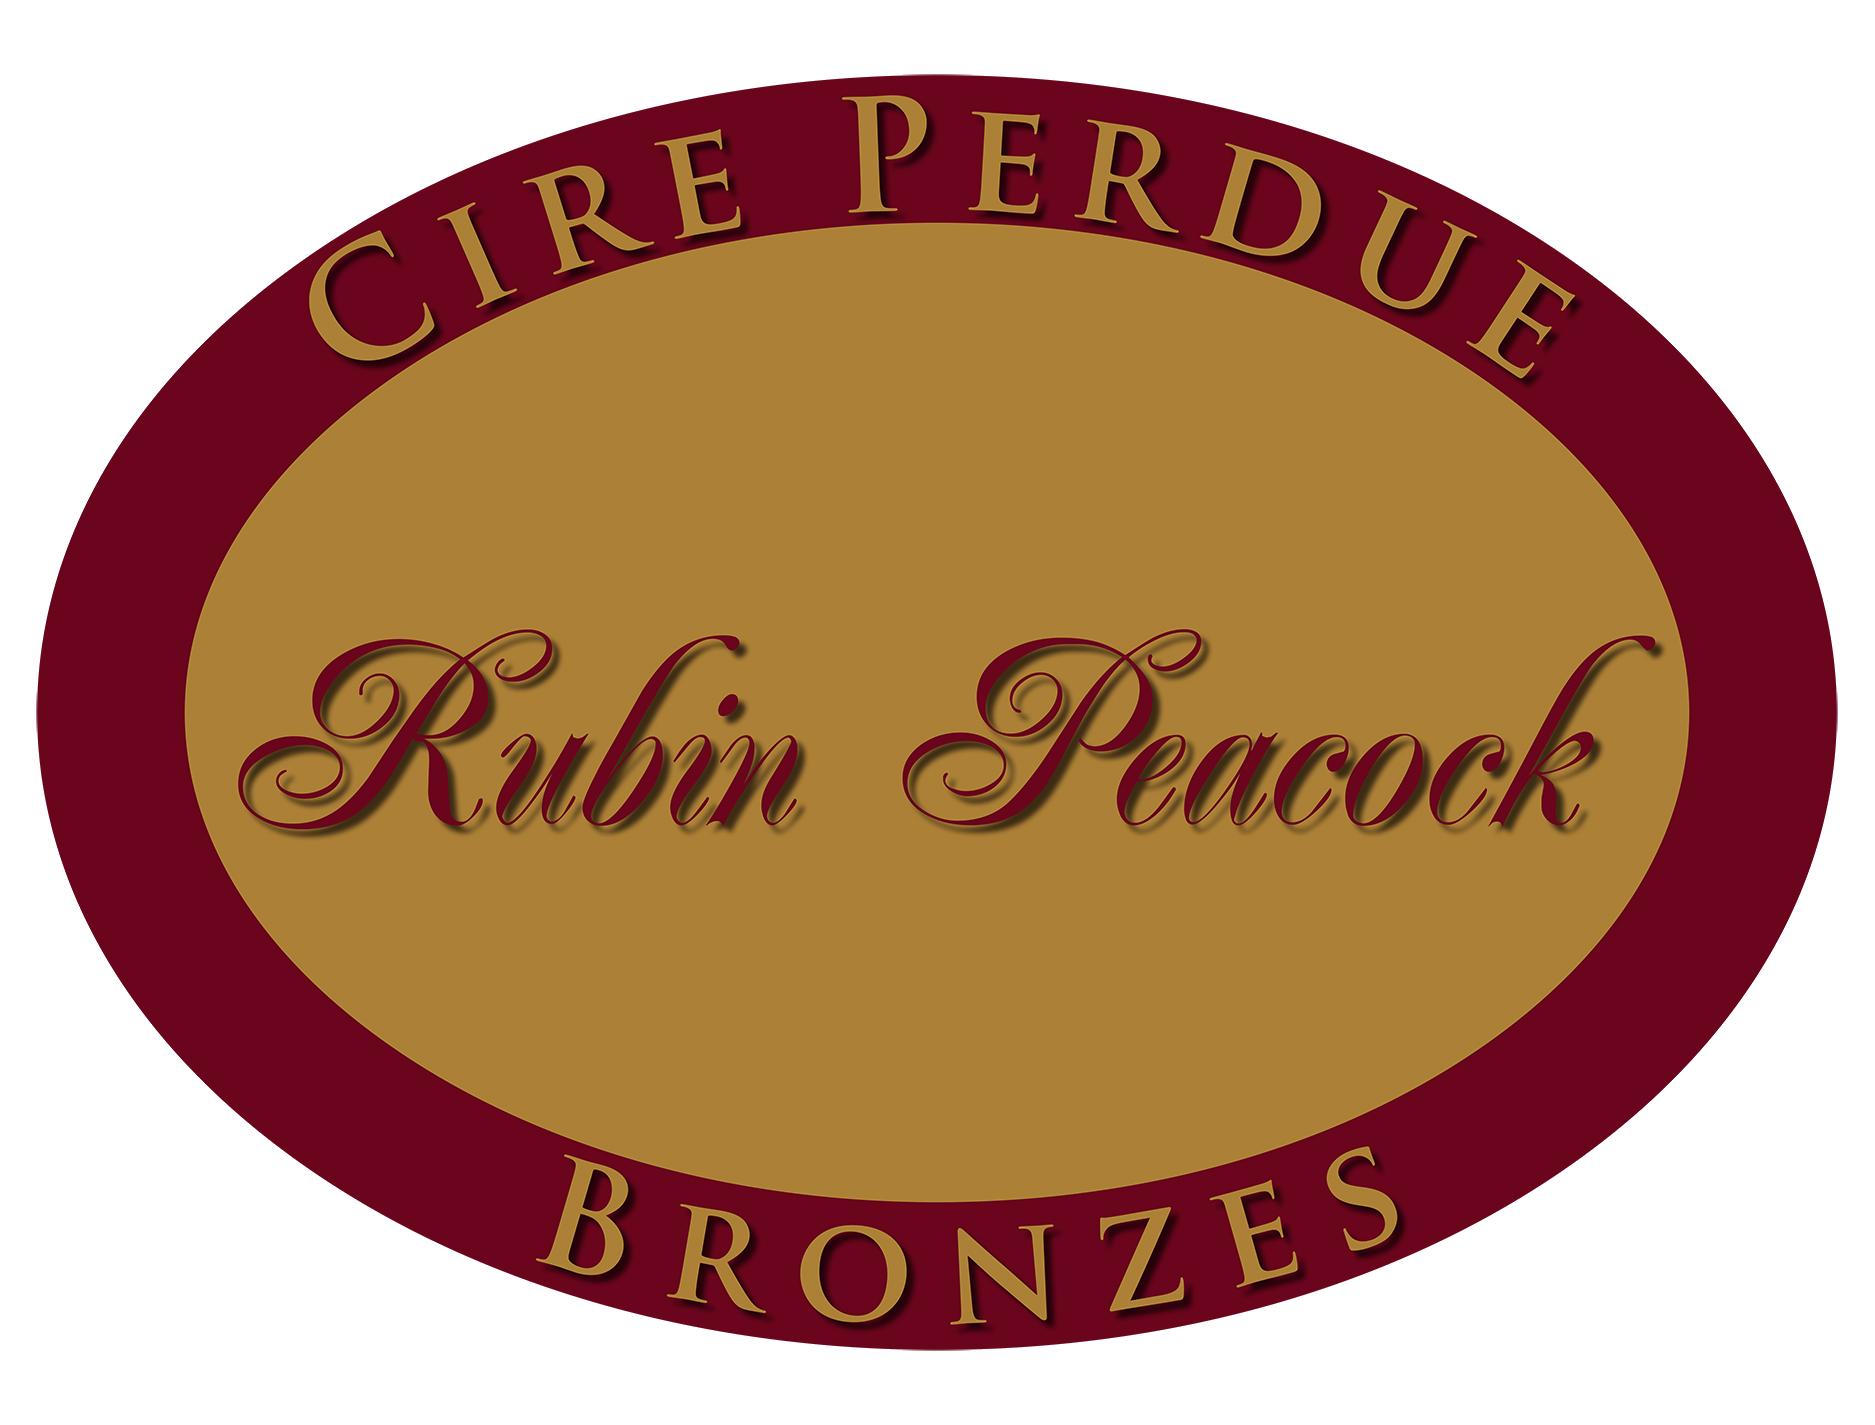 Rubin Peacock Bronzes